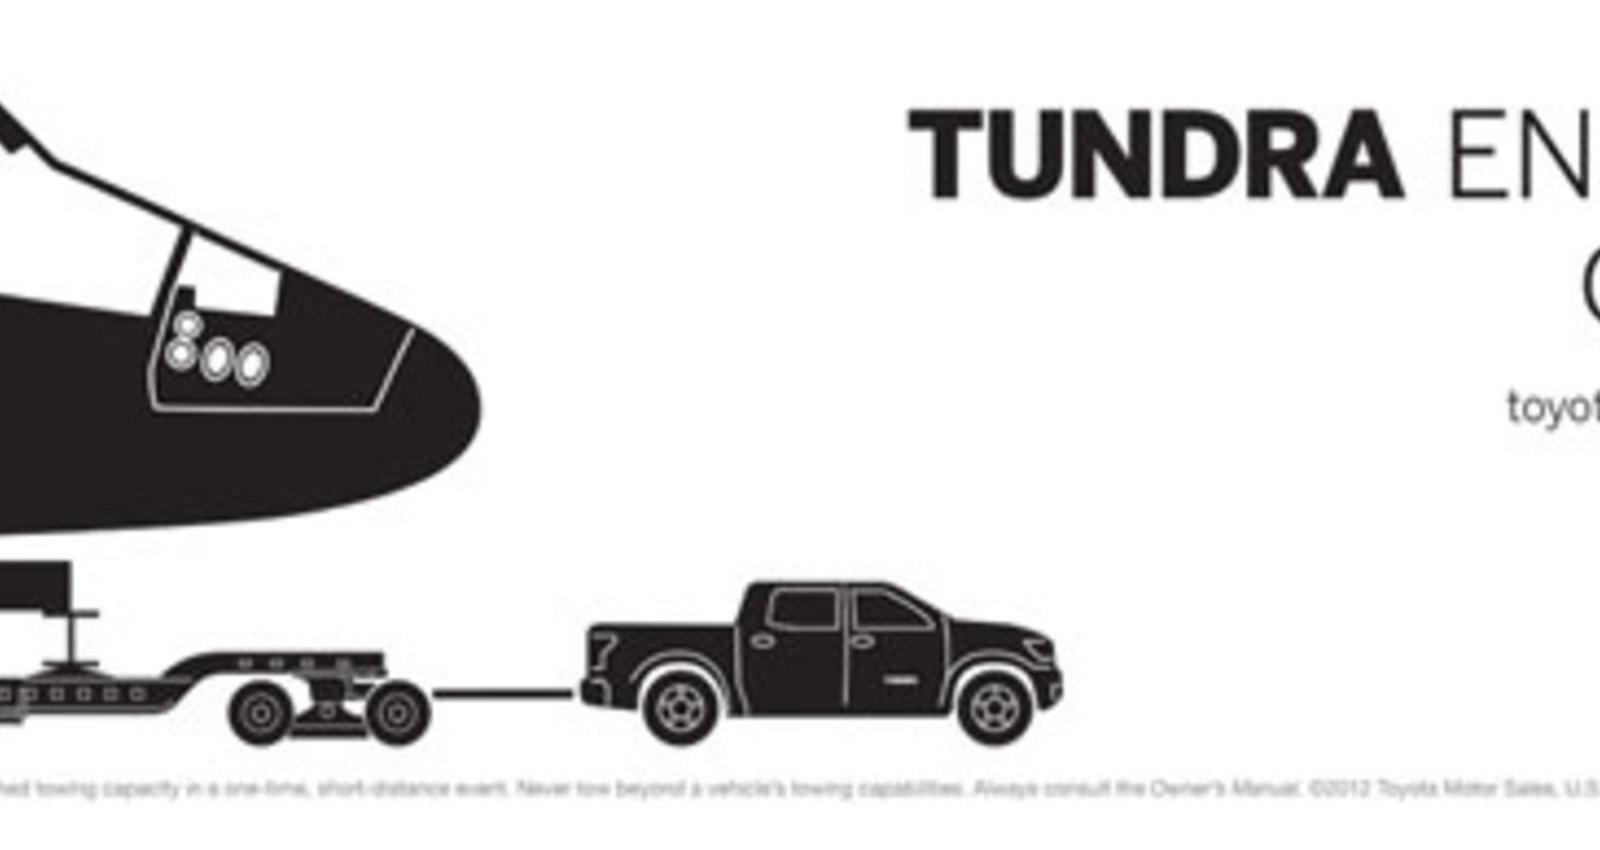 Tundra Shuttle Endeavour Campaign